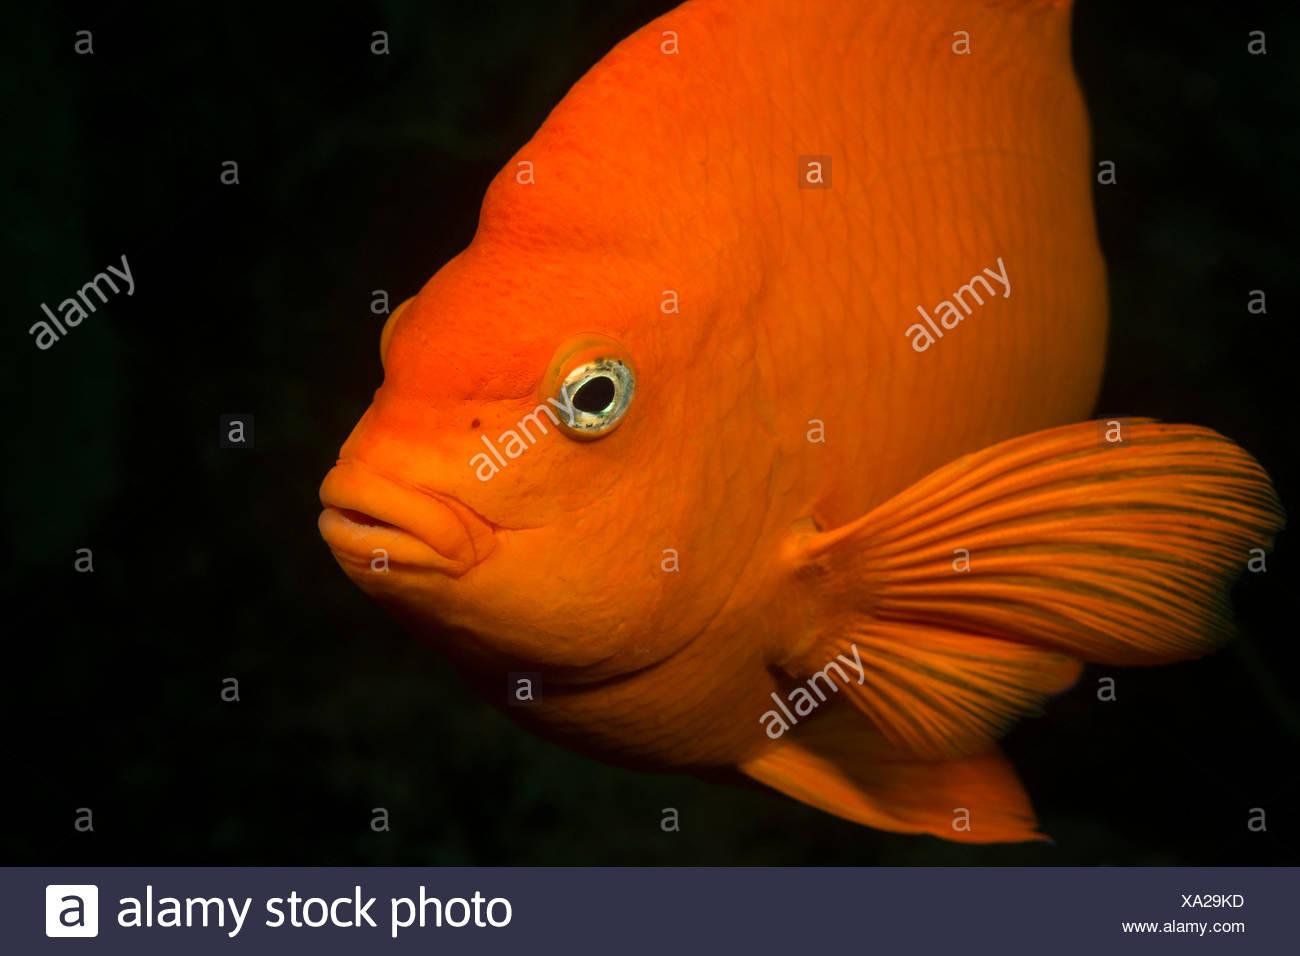 Garibaldi, pesce hypsypops rubicundus, Isola Catalina, california, Stati Uniti d'America Immagini Stock